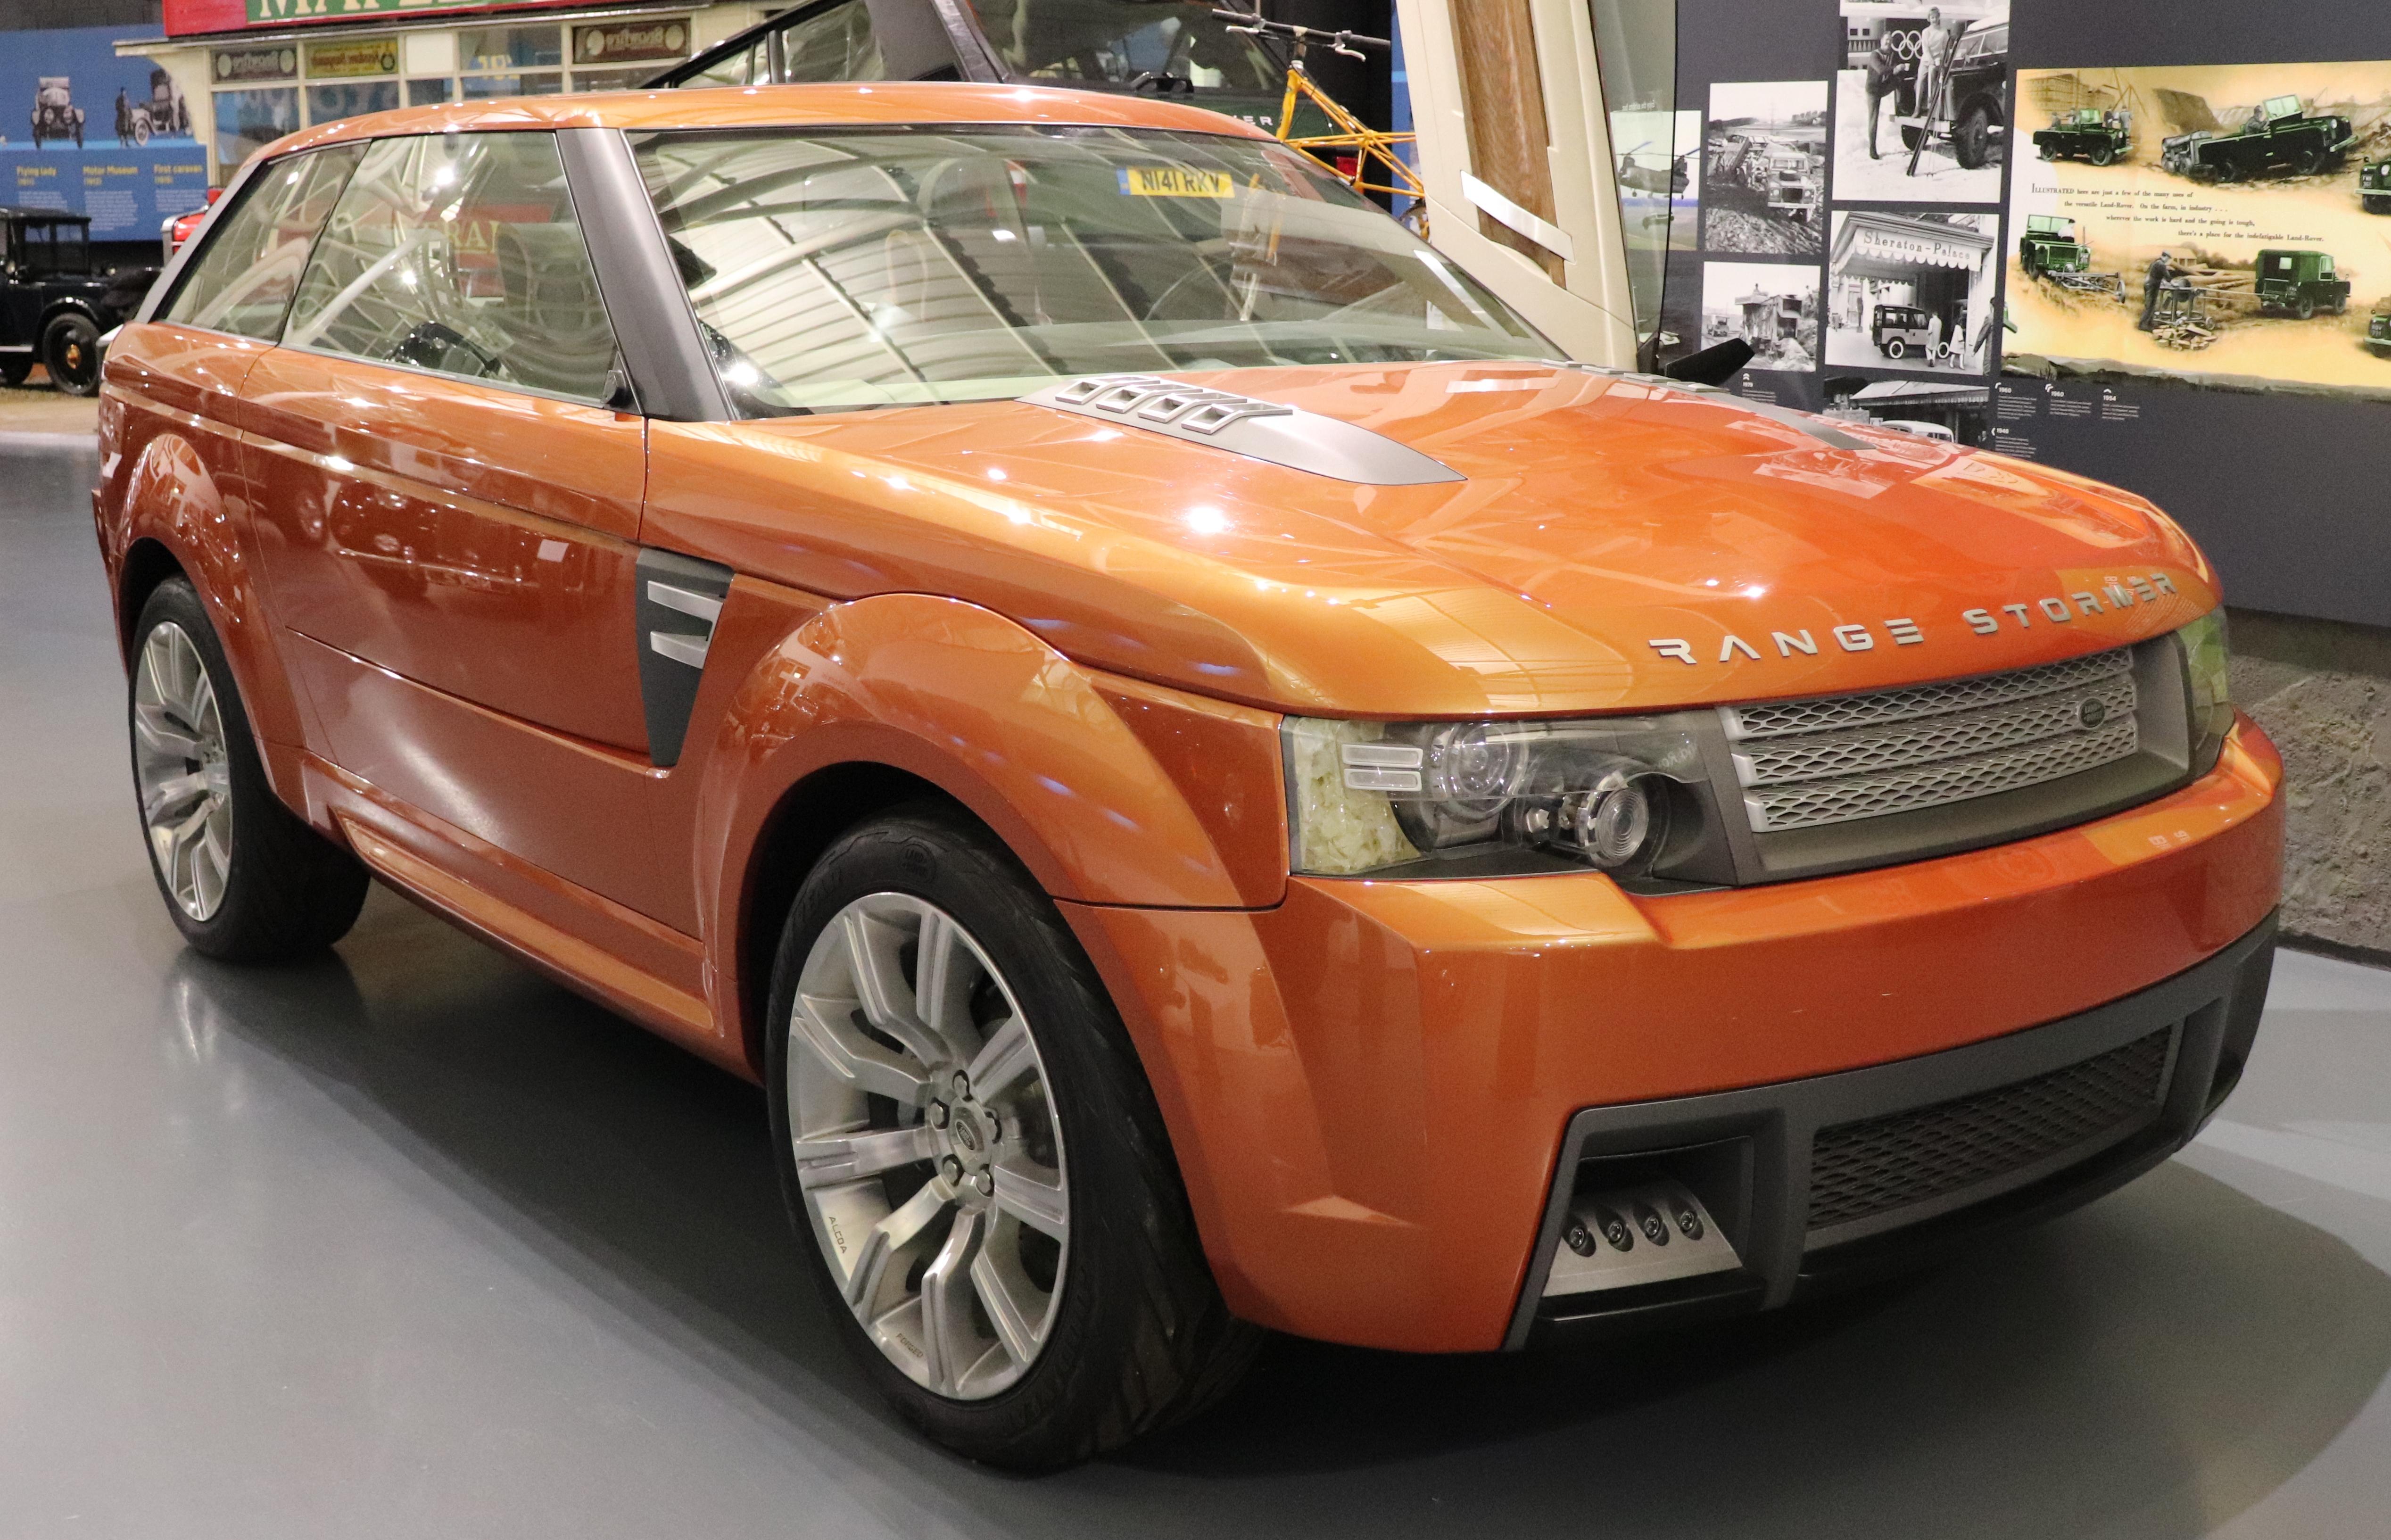 https://upload.wikimedia.org/wikipedia/commons/7/7d/2004_Land_Rover_Range_Stormer_Concept_4.2_Front.jpg